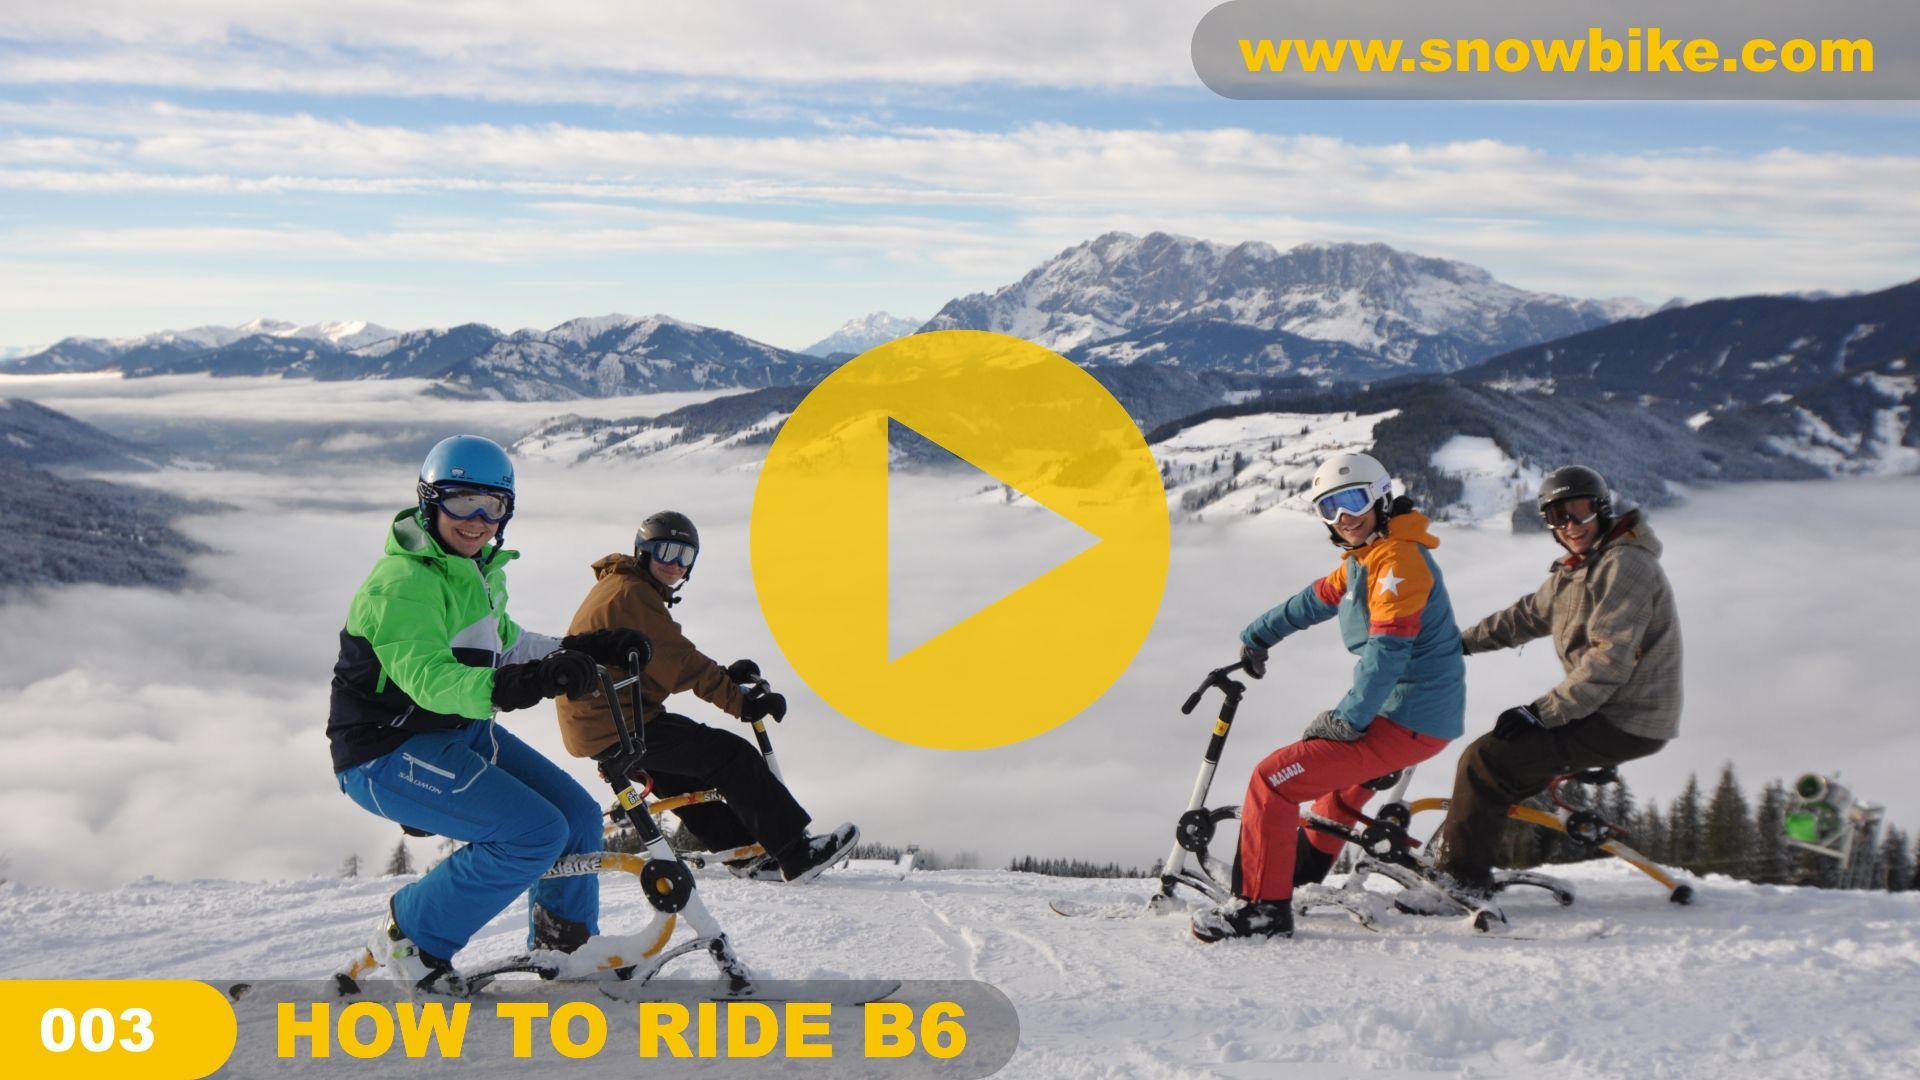 snowbike-basics-how-to-ride-b6-coverA006BD81-9790-677E-C78F-00C0A6C7EC59.jpg